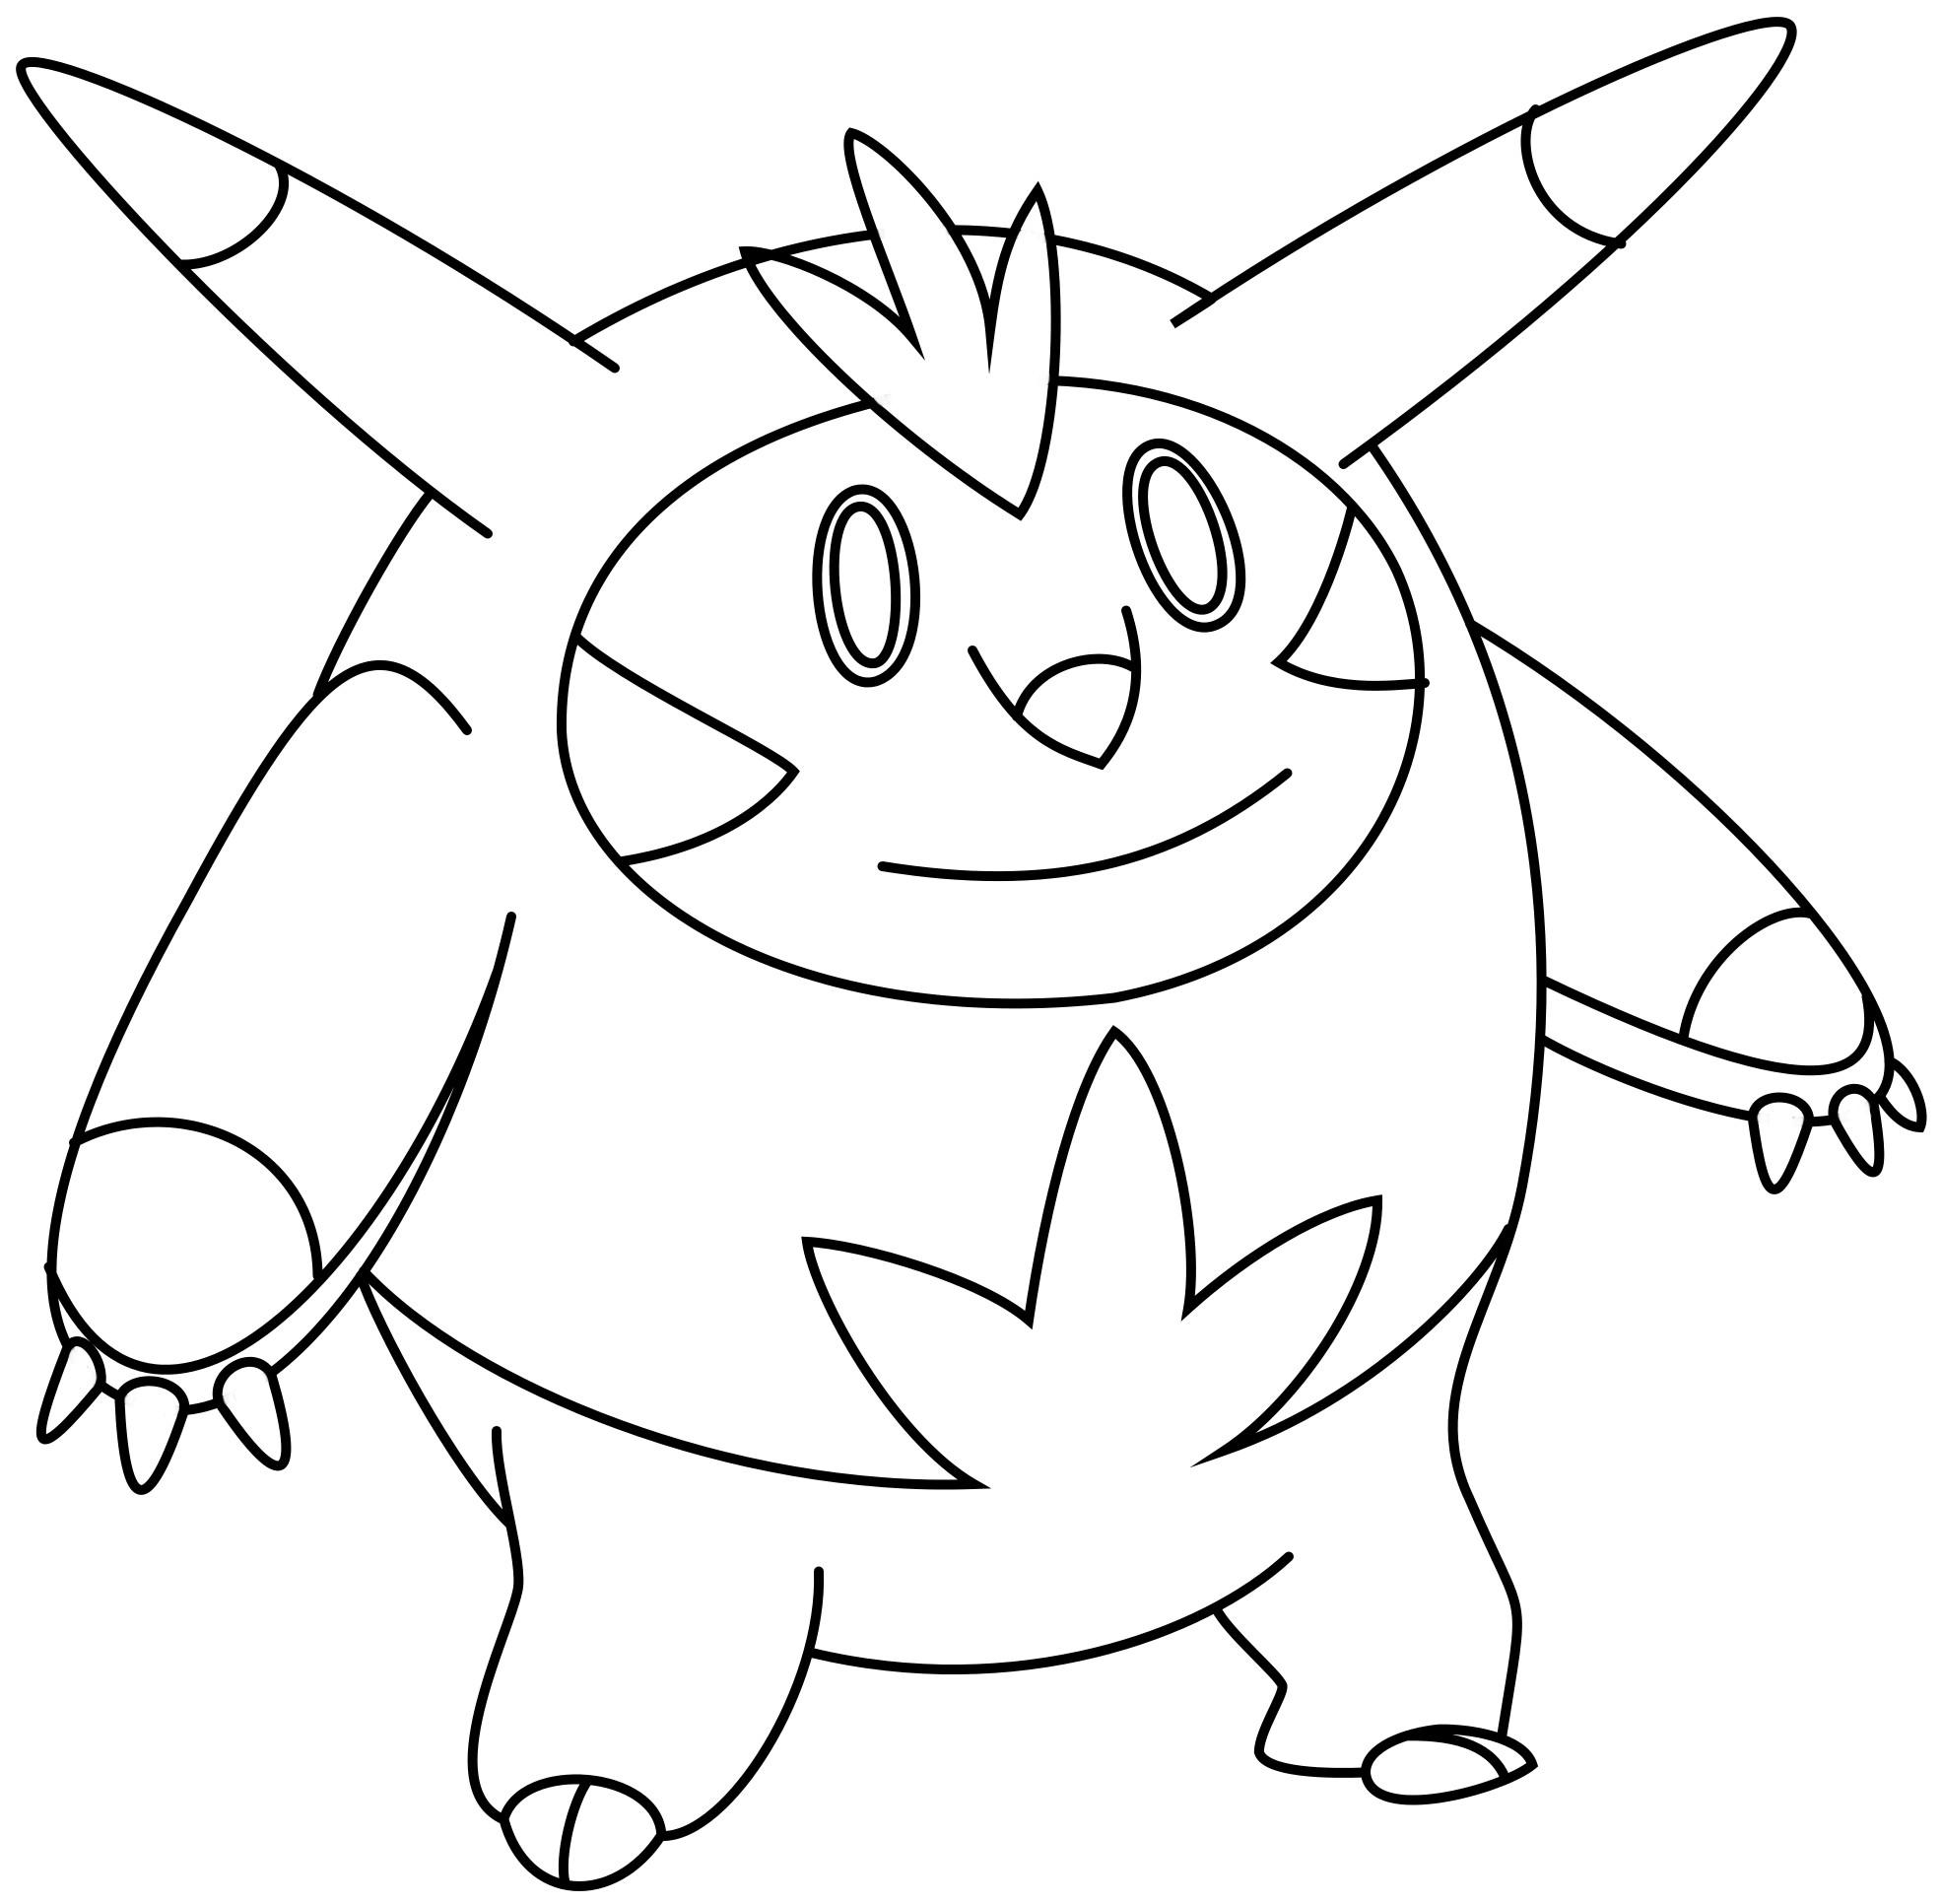 pokmon von team rocket. ausmalbilder pokemon groudon 383 groudon g ...